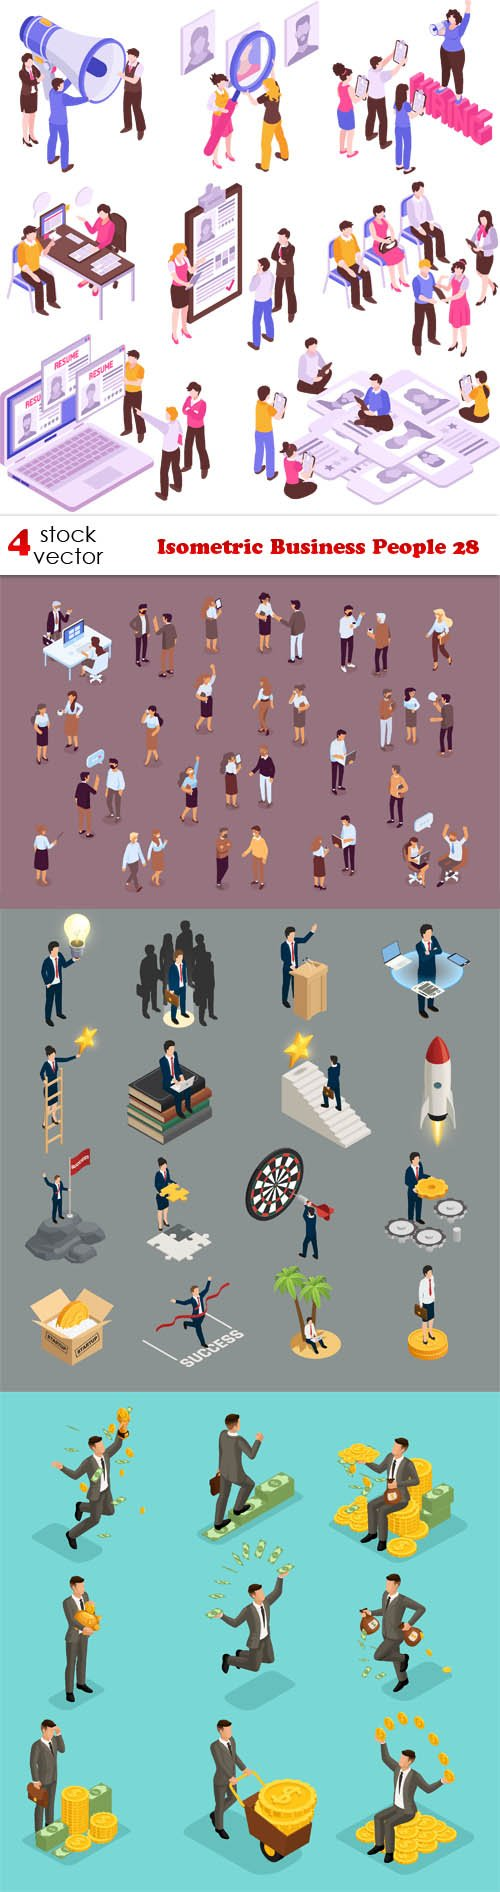 Vectors - Isometric Business People 28